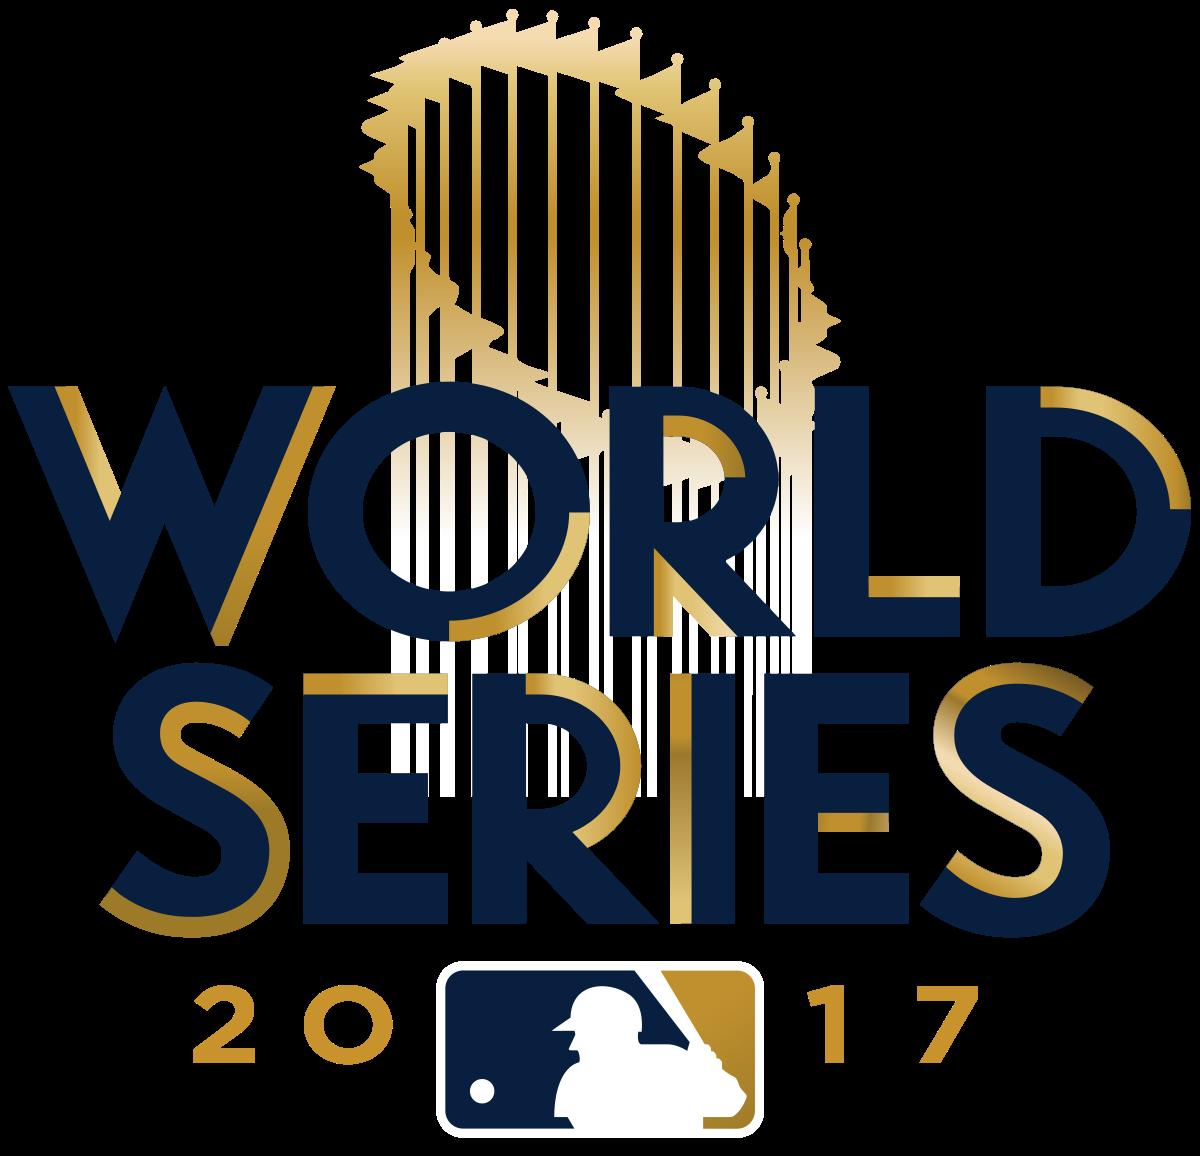 2017 Champions Houston Astros World series 2017, Mlb